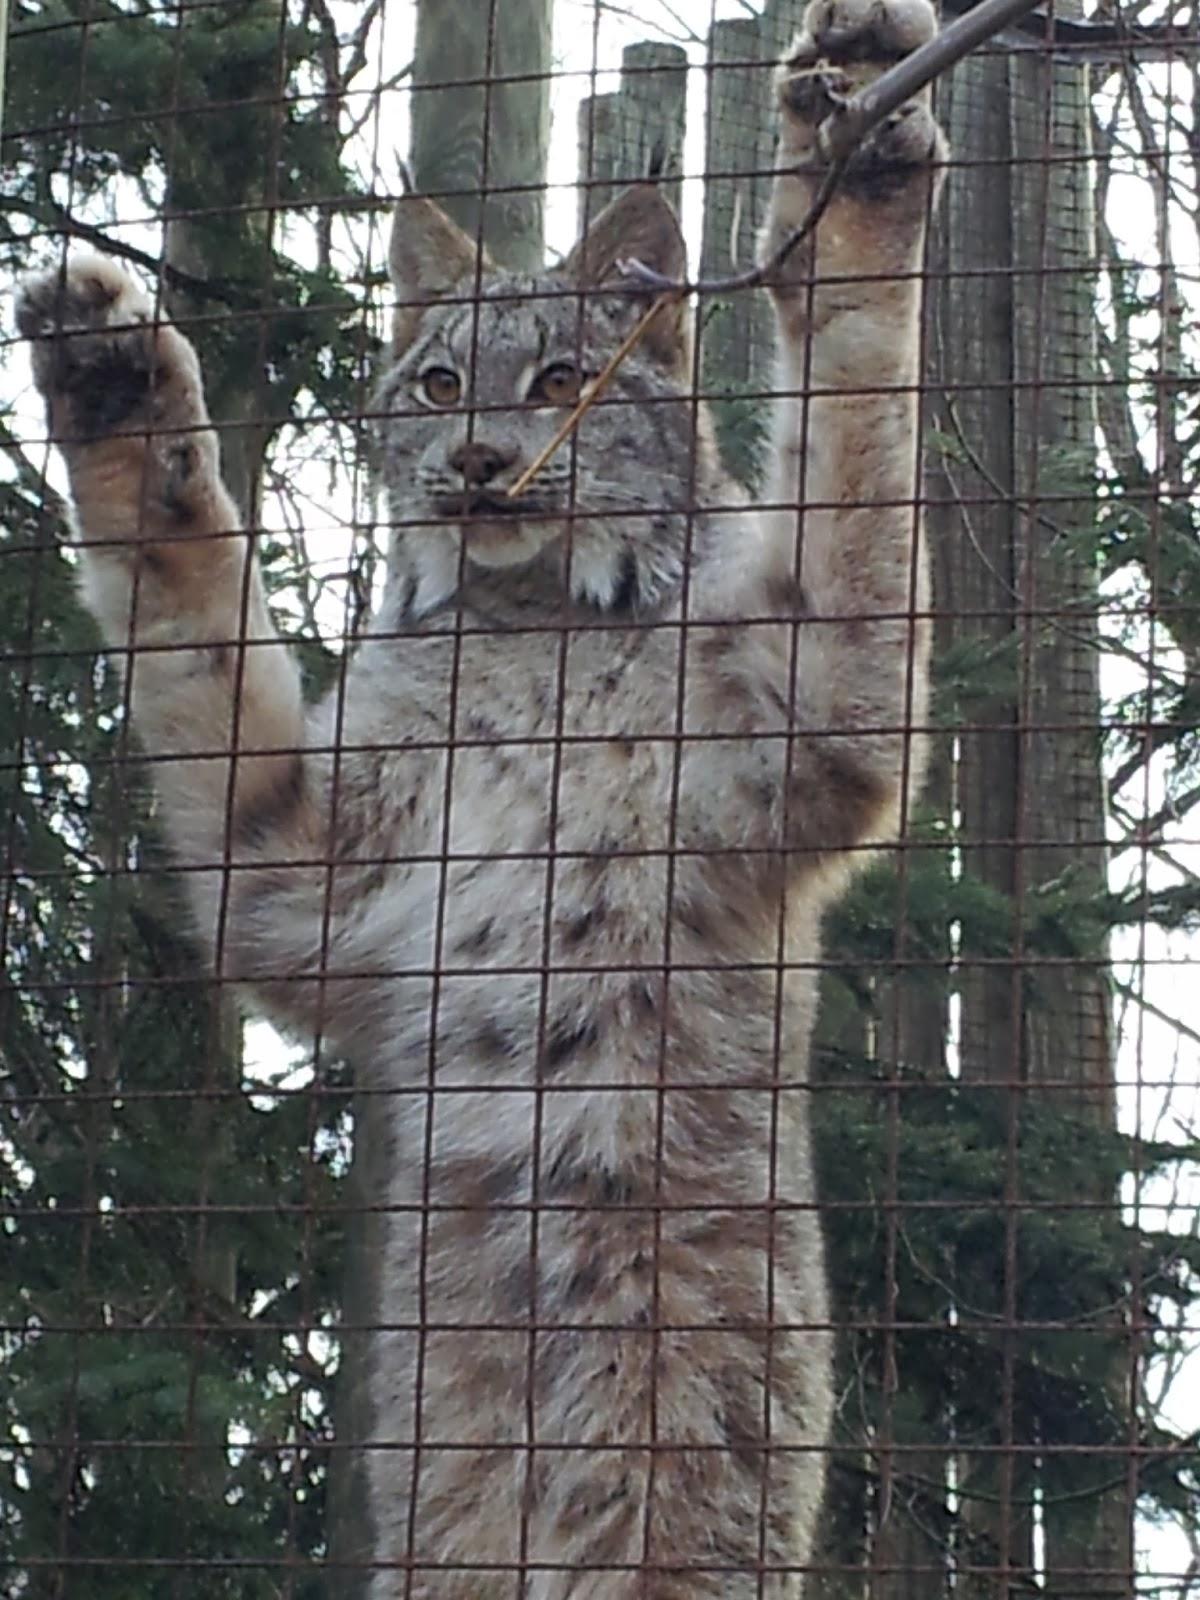 lynx, zoo, Toronto Zoo, animals